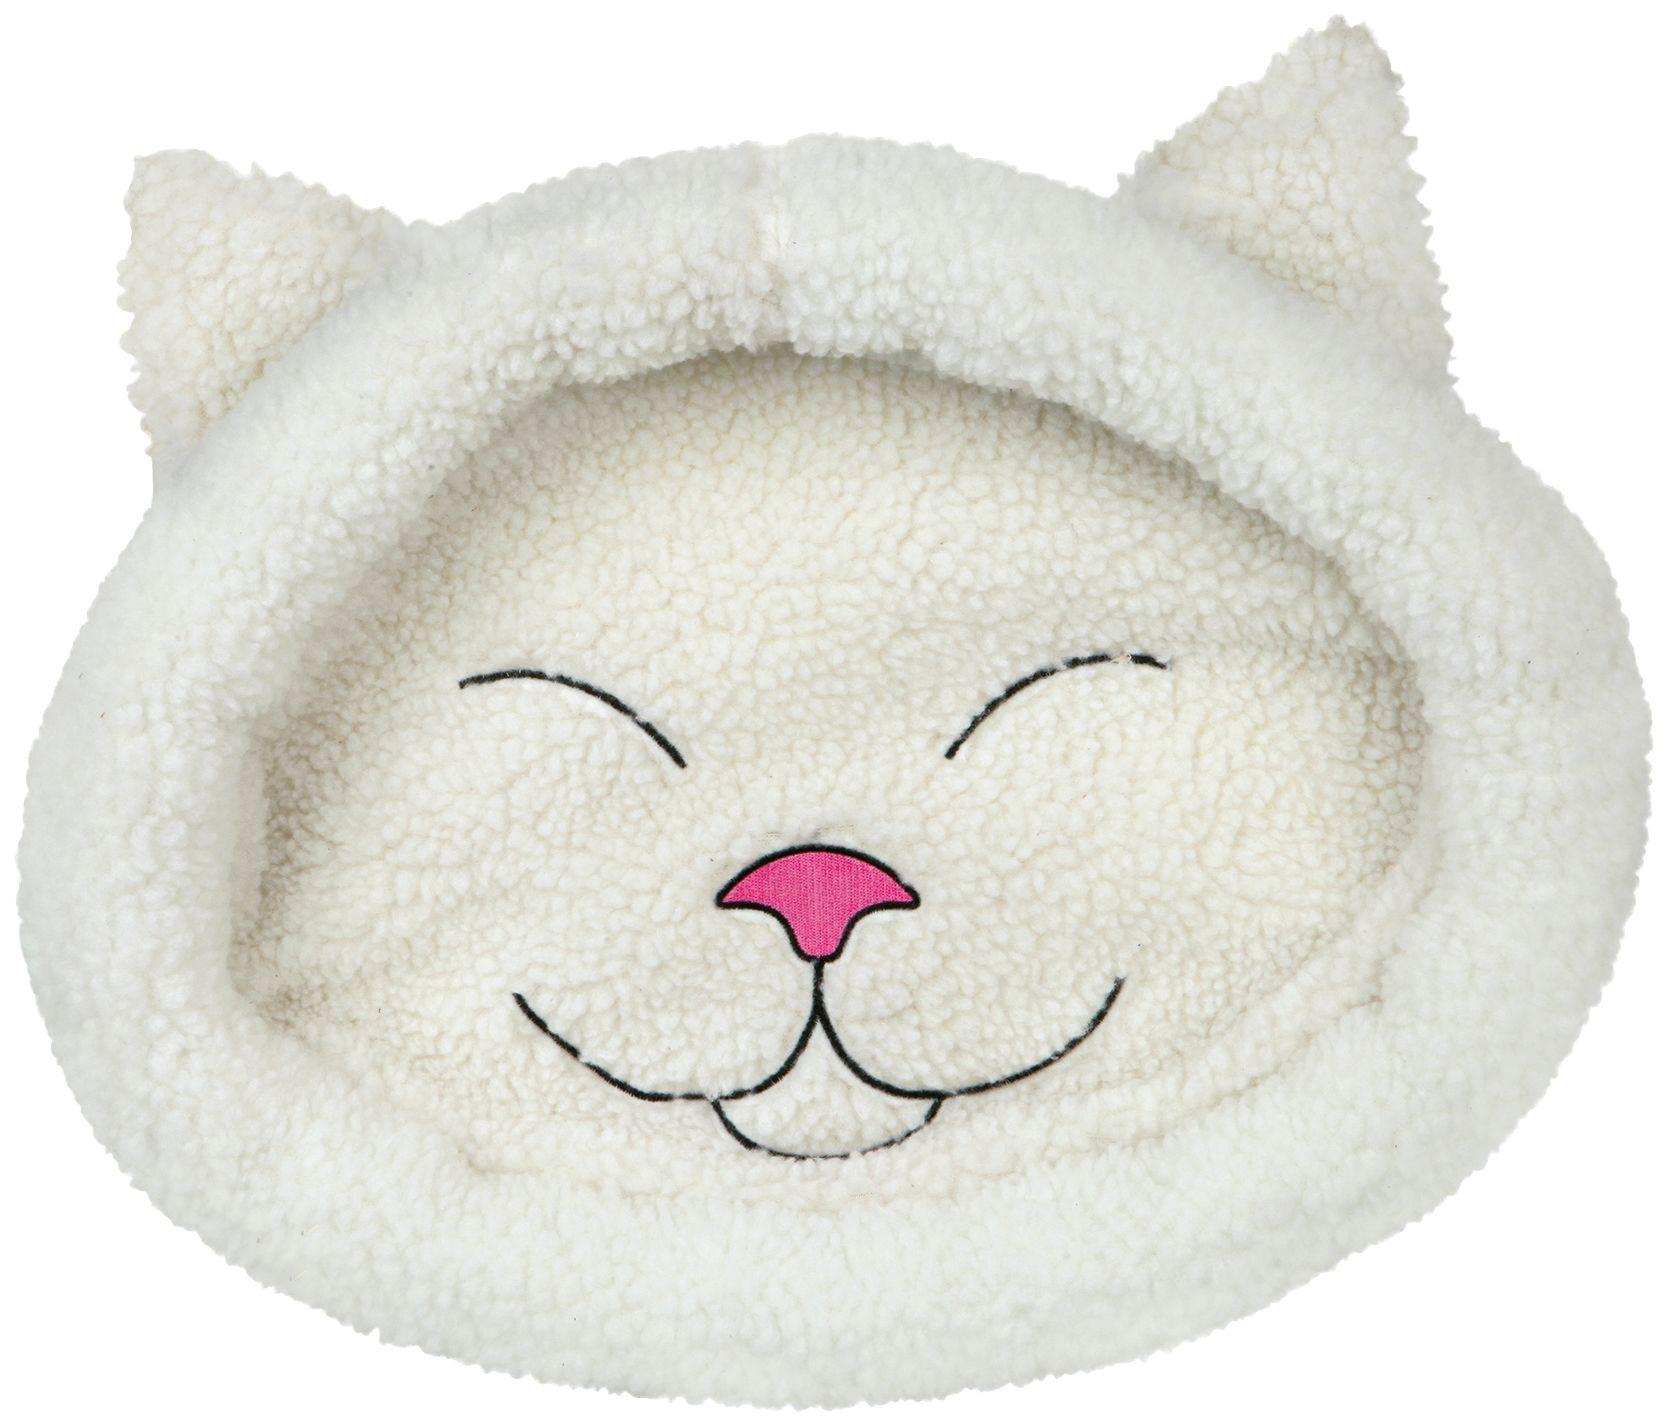 HEIM  Hundebett und Katzenbett »Mizzi«, Lammfell-Optik, BxL: 37x48 cm